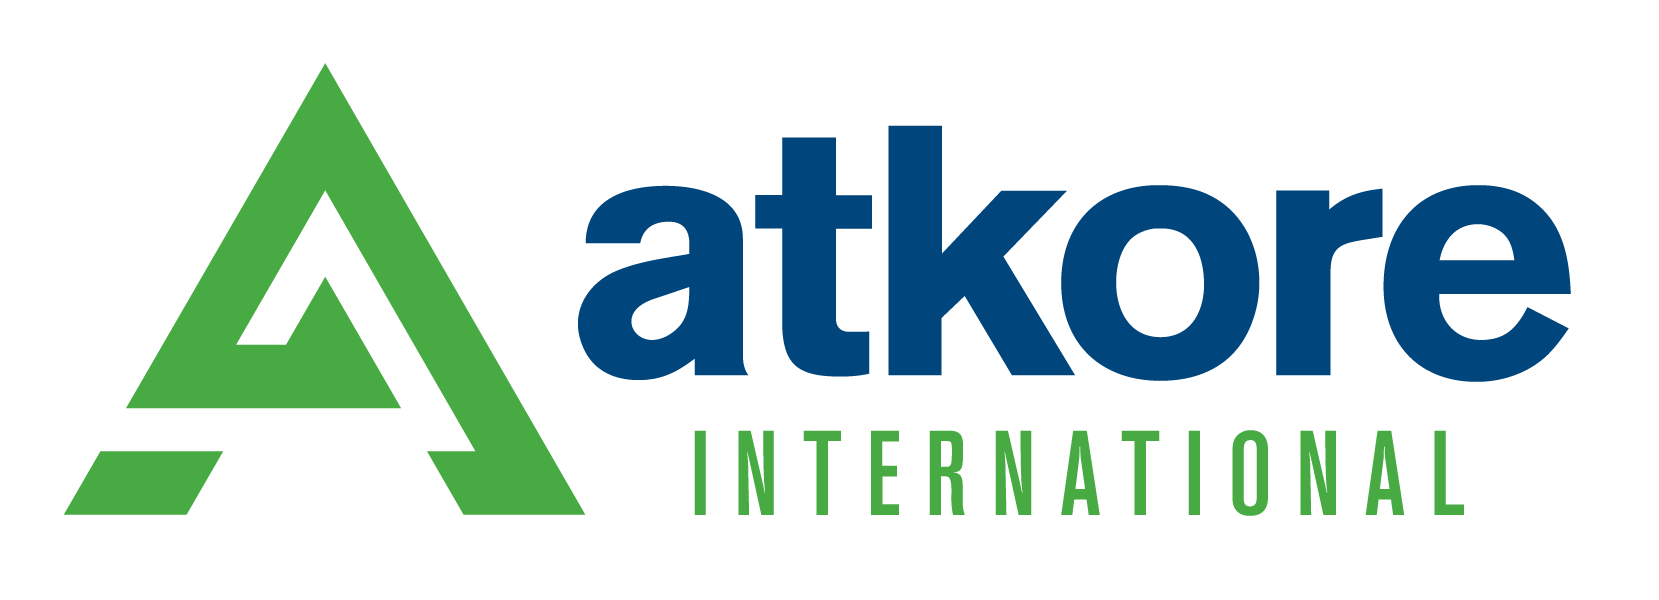 ATKR logo